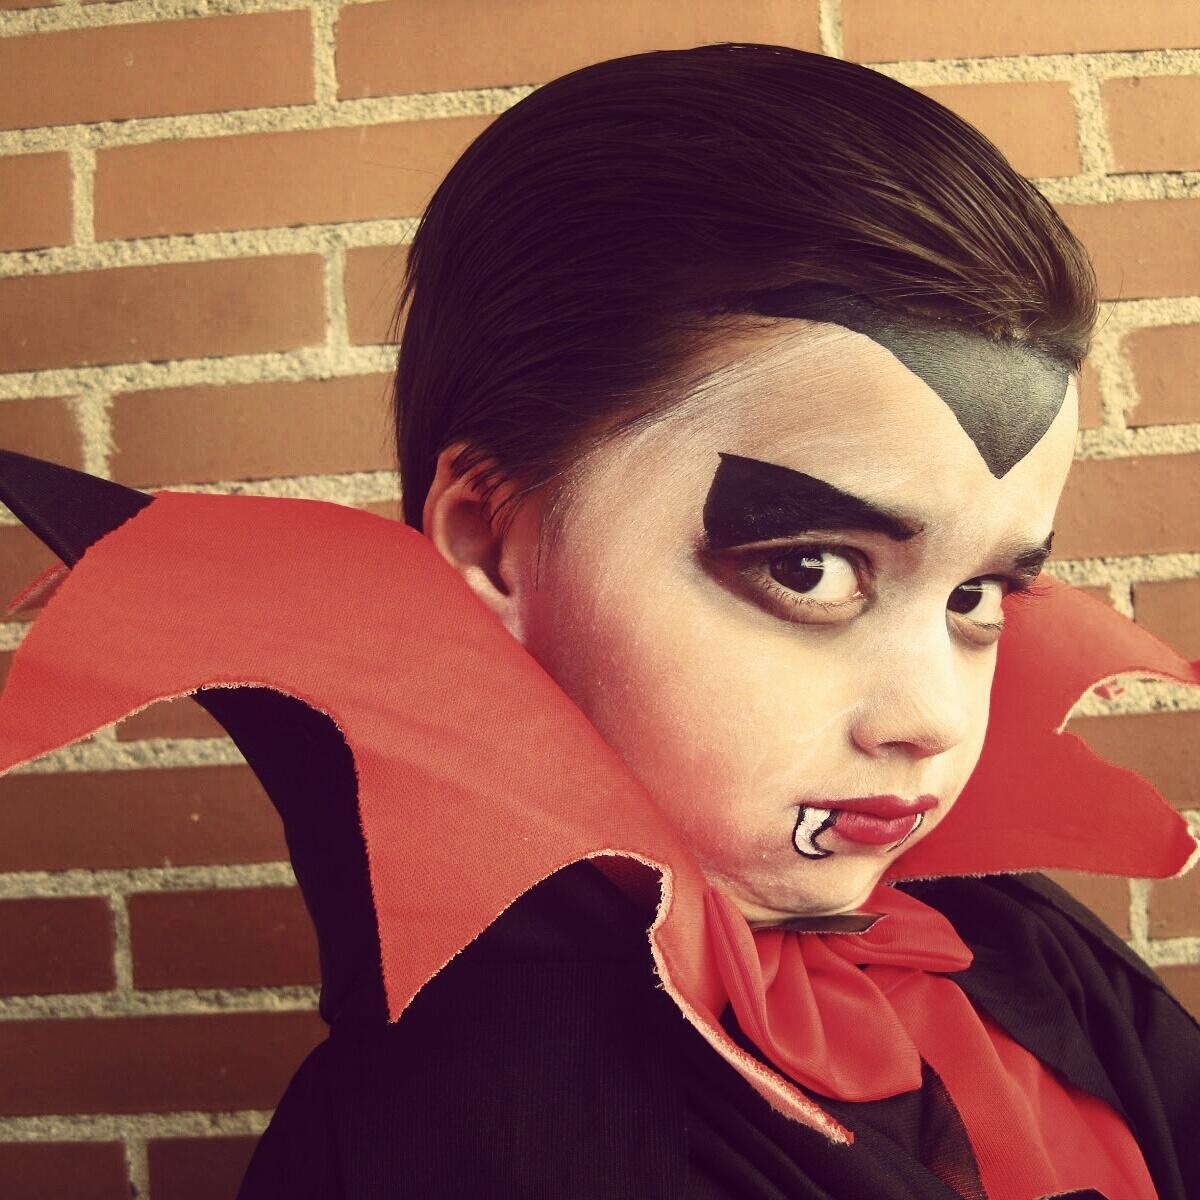 vampiro a la vista